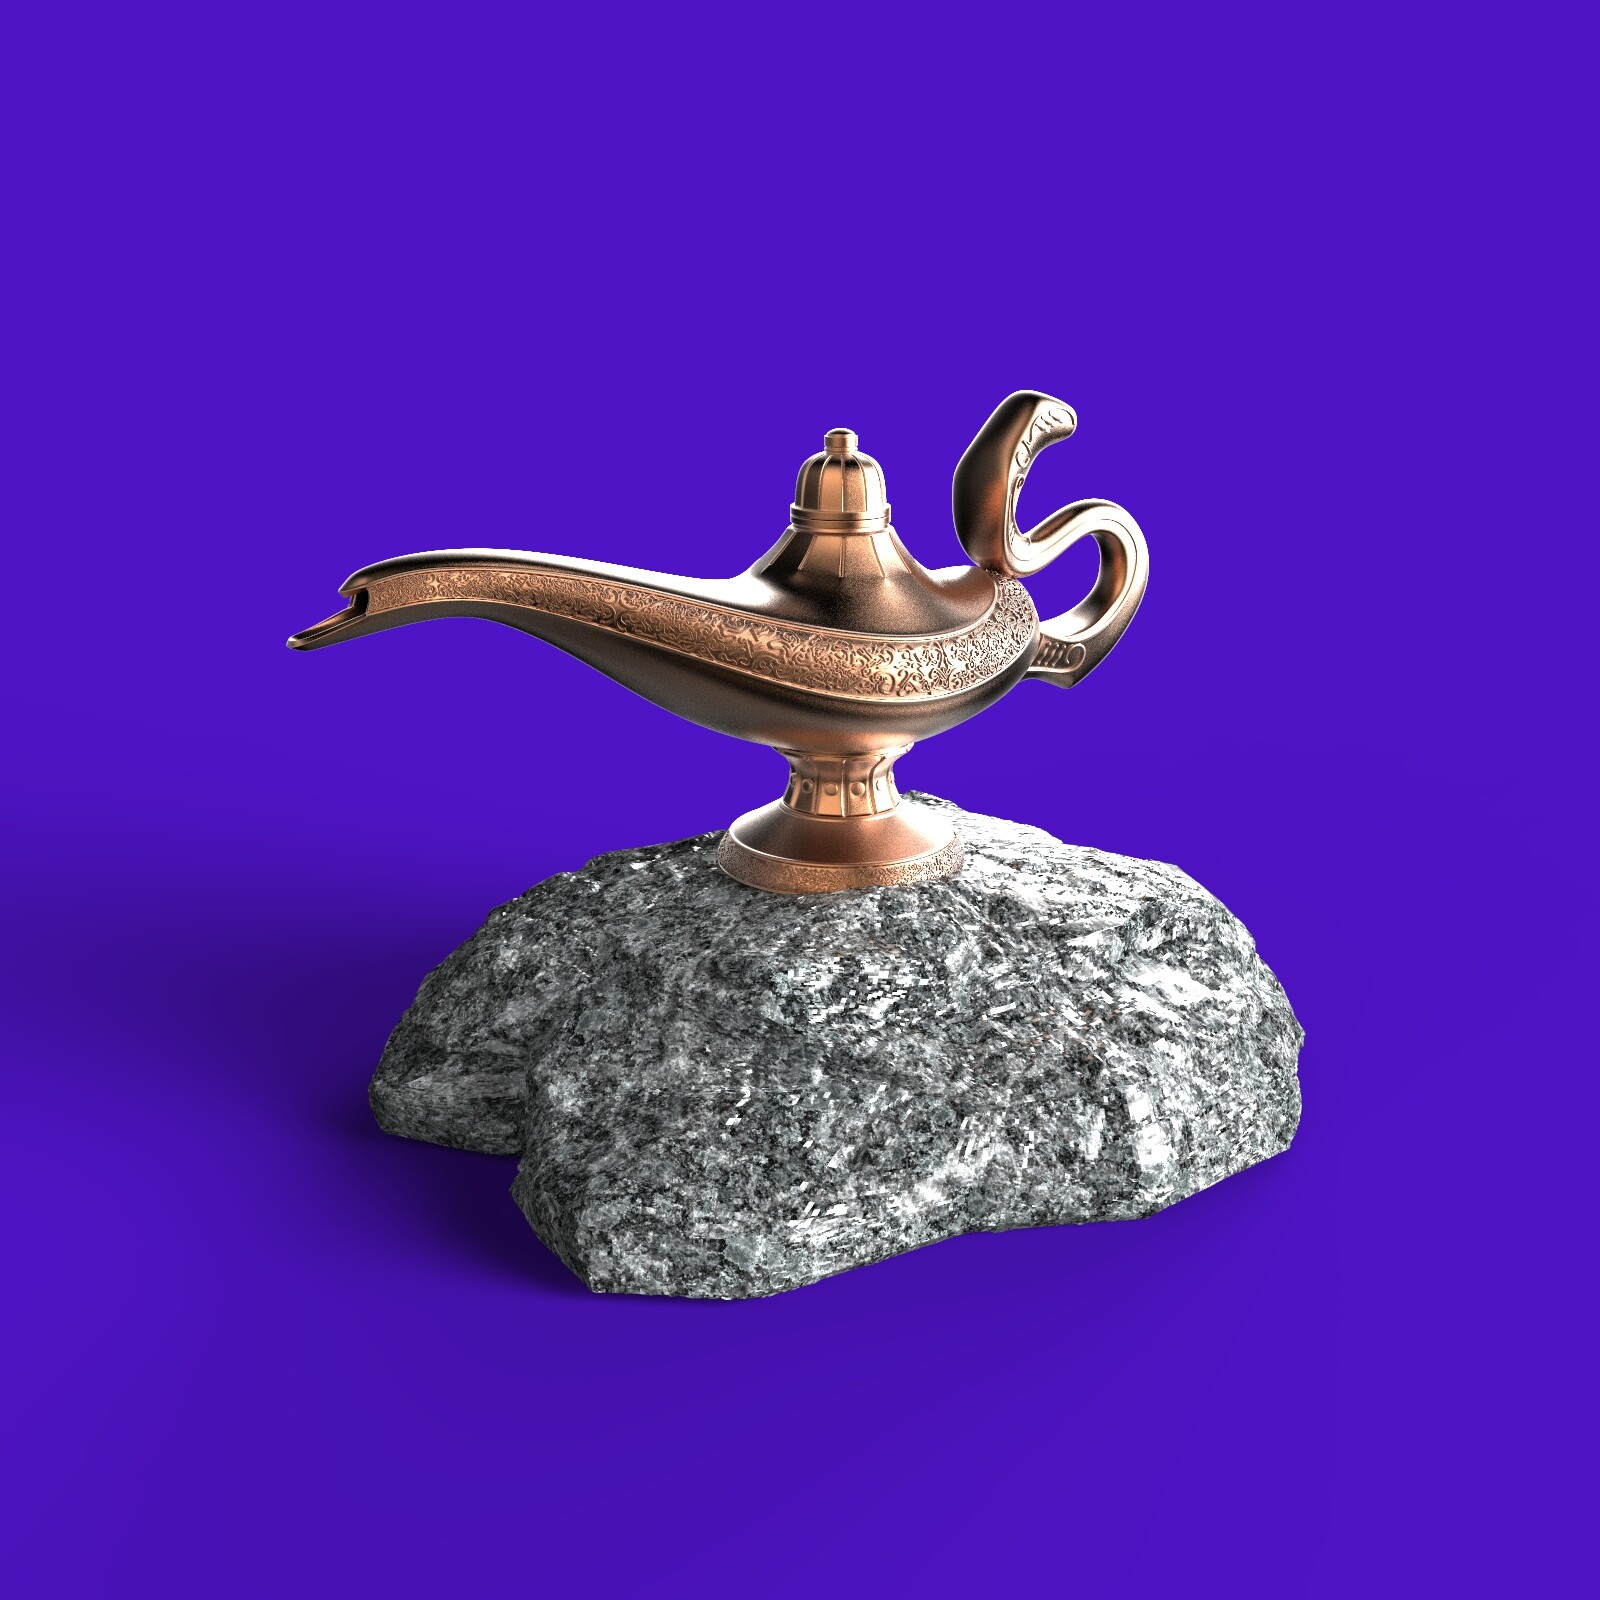 Wladimir Kovalenko - Aladdin's Lamp (movie 2019)